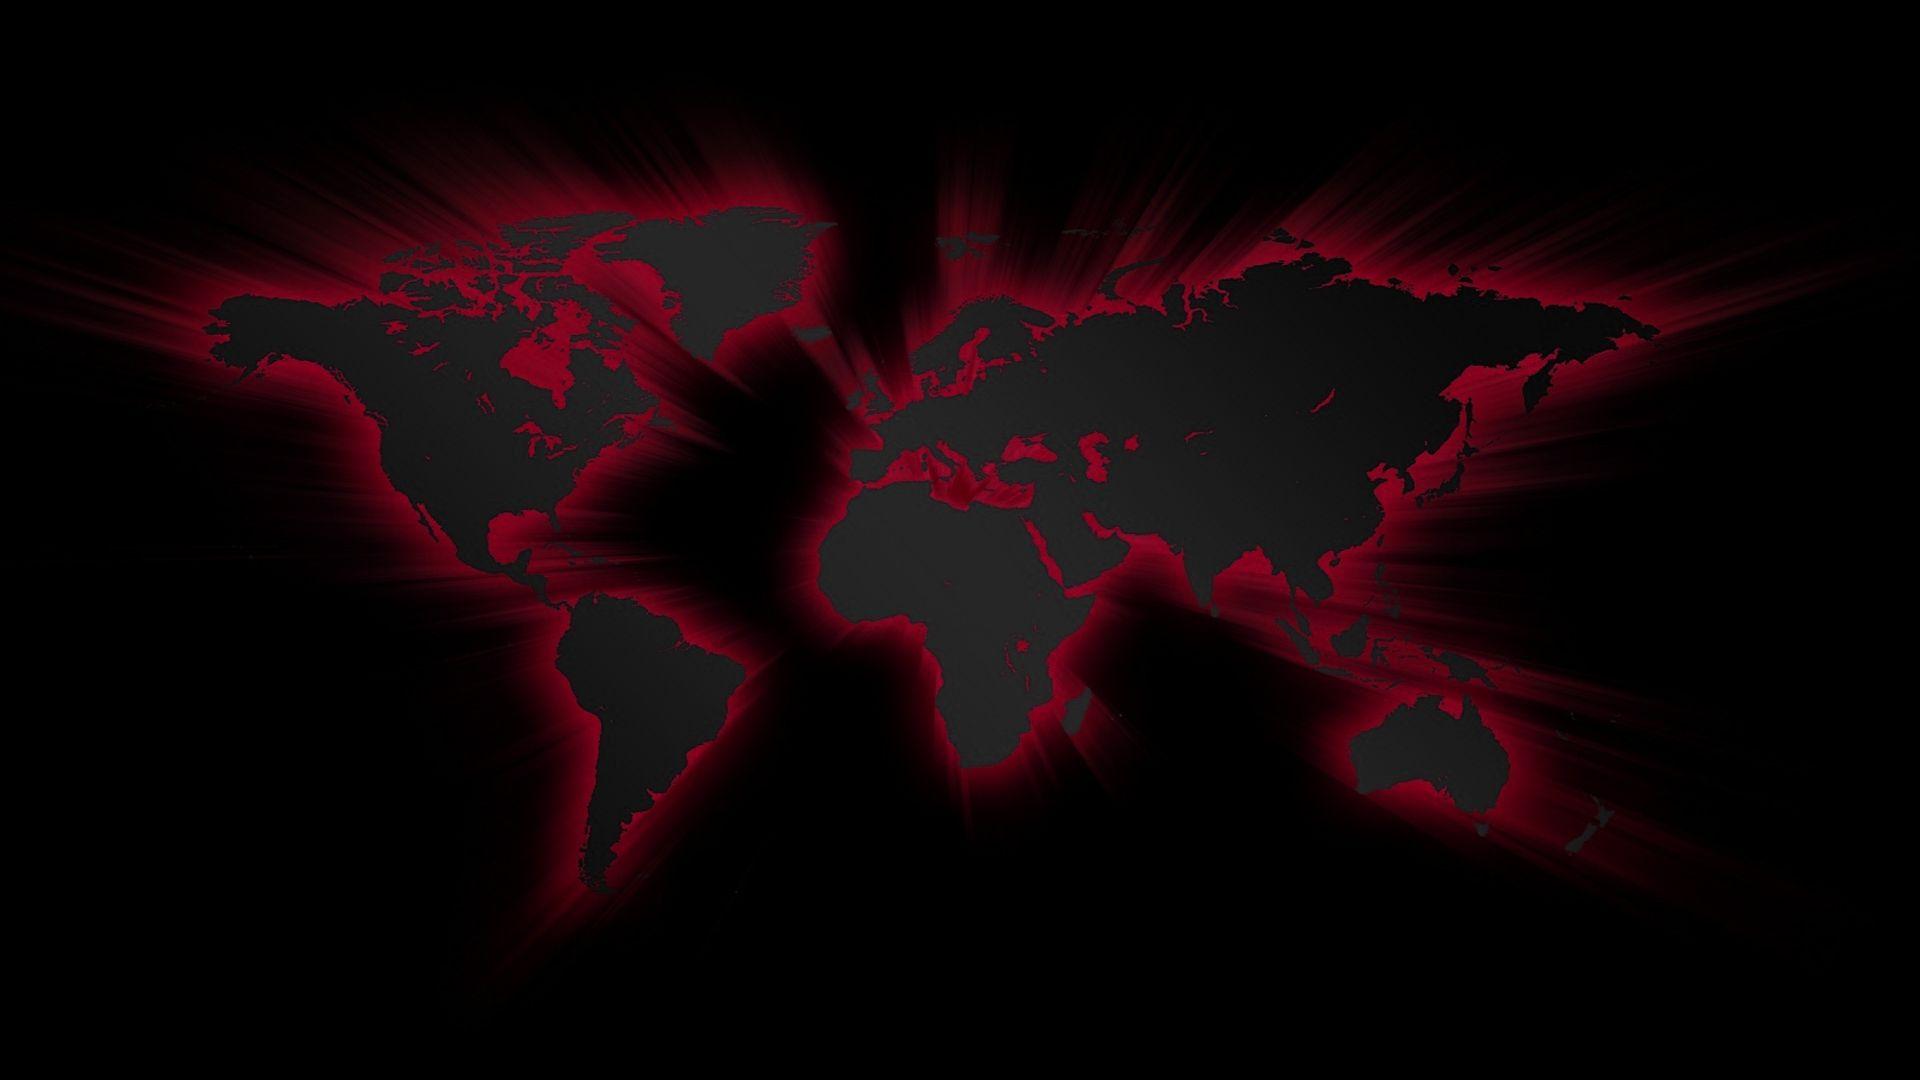 World black full graphics creative hd wallpaper things pinterest world map black hd wallpaper wallpapers hd wallpaper gumiabroncs Choice Image